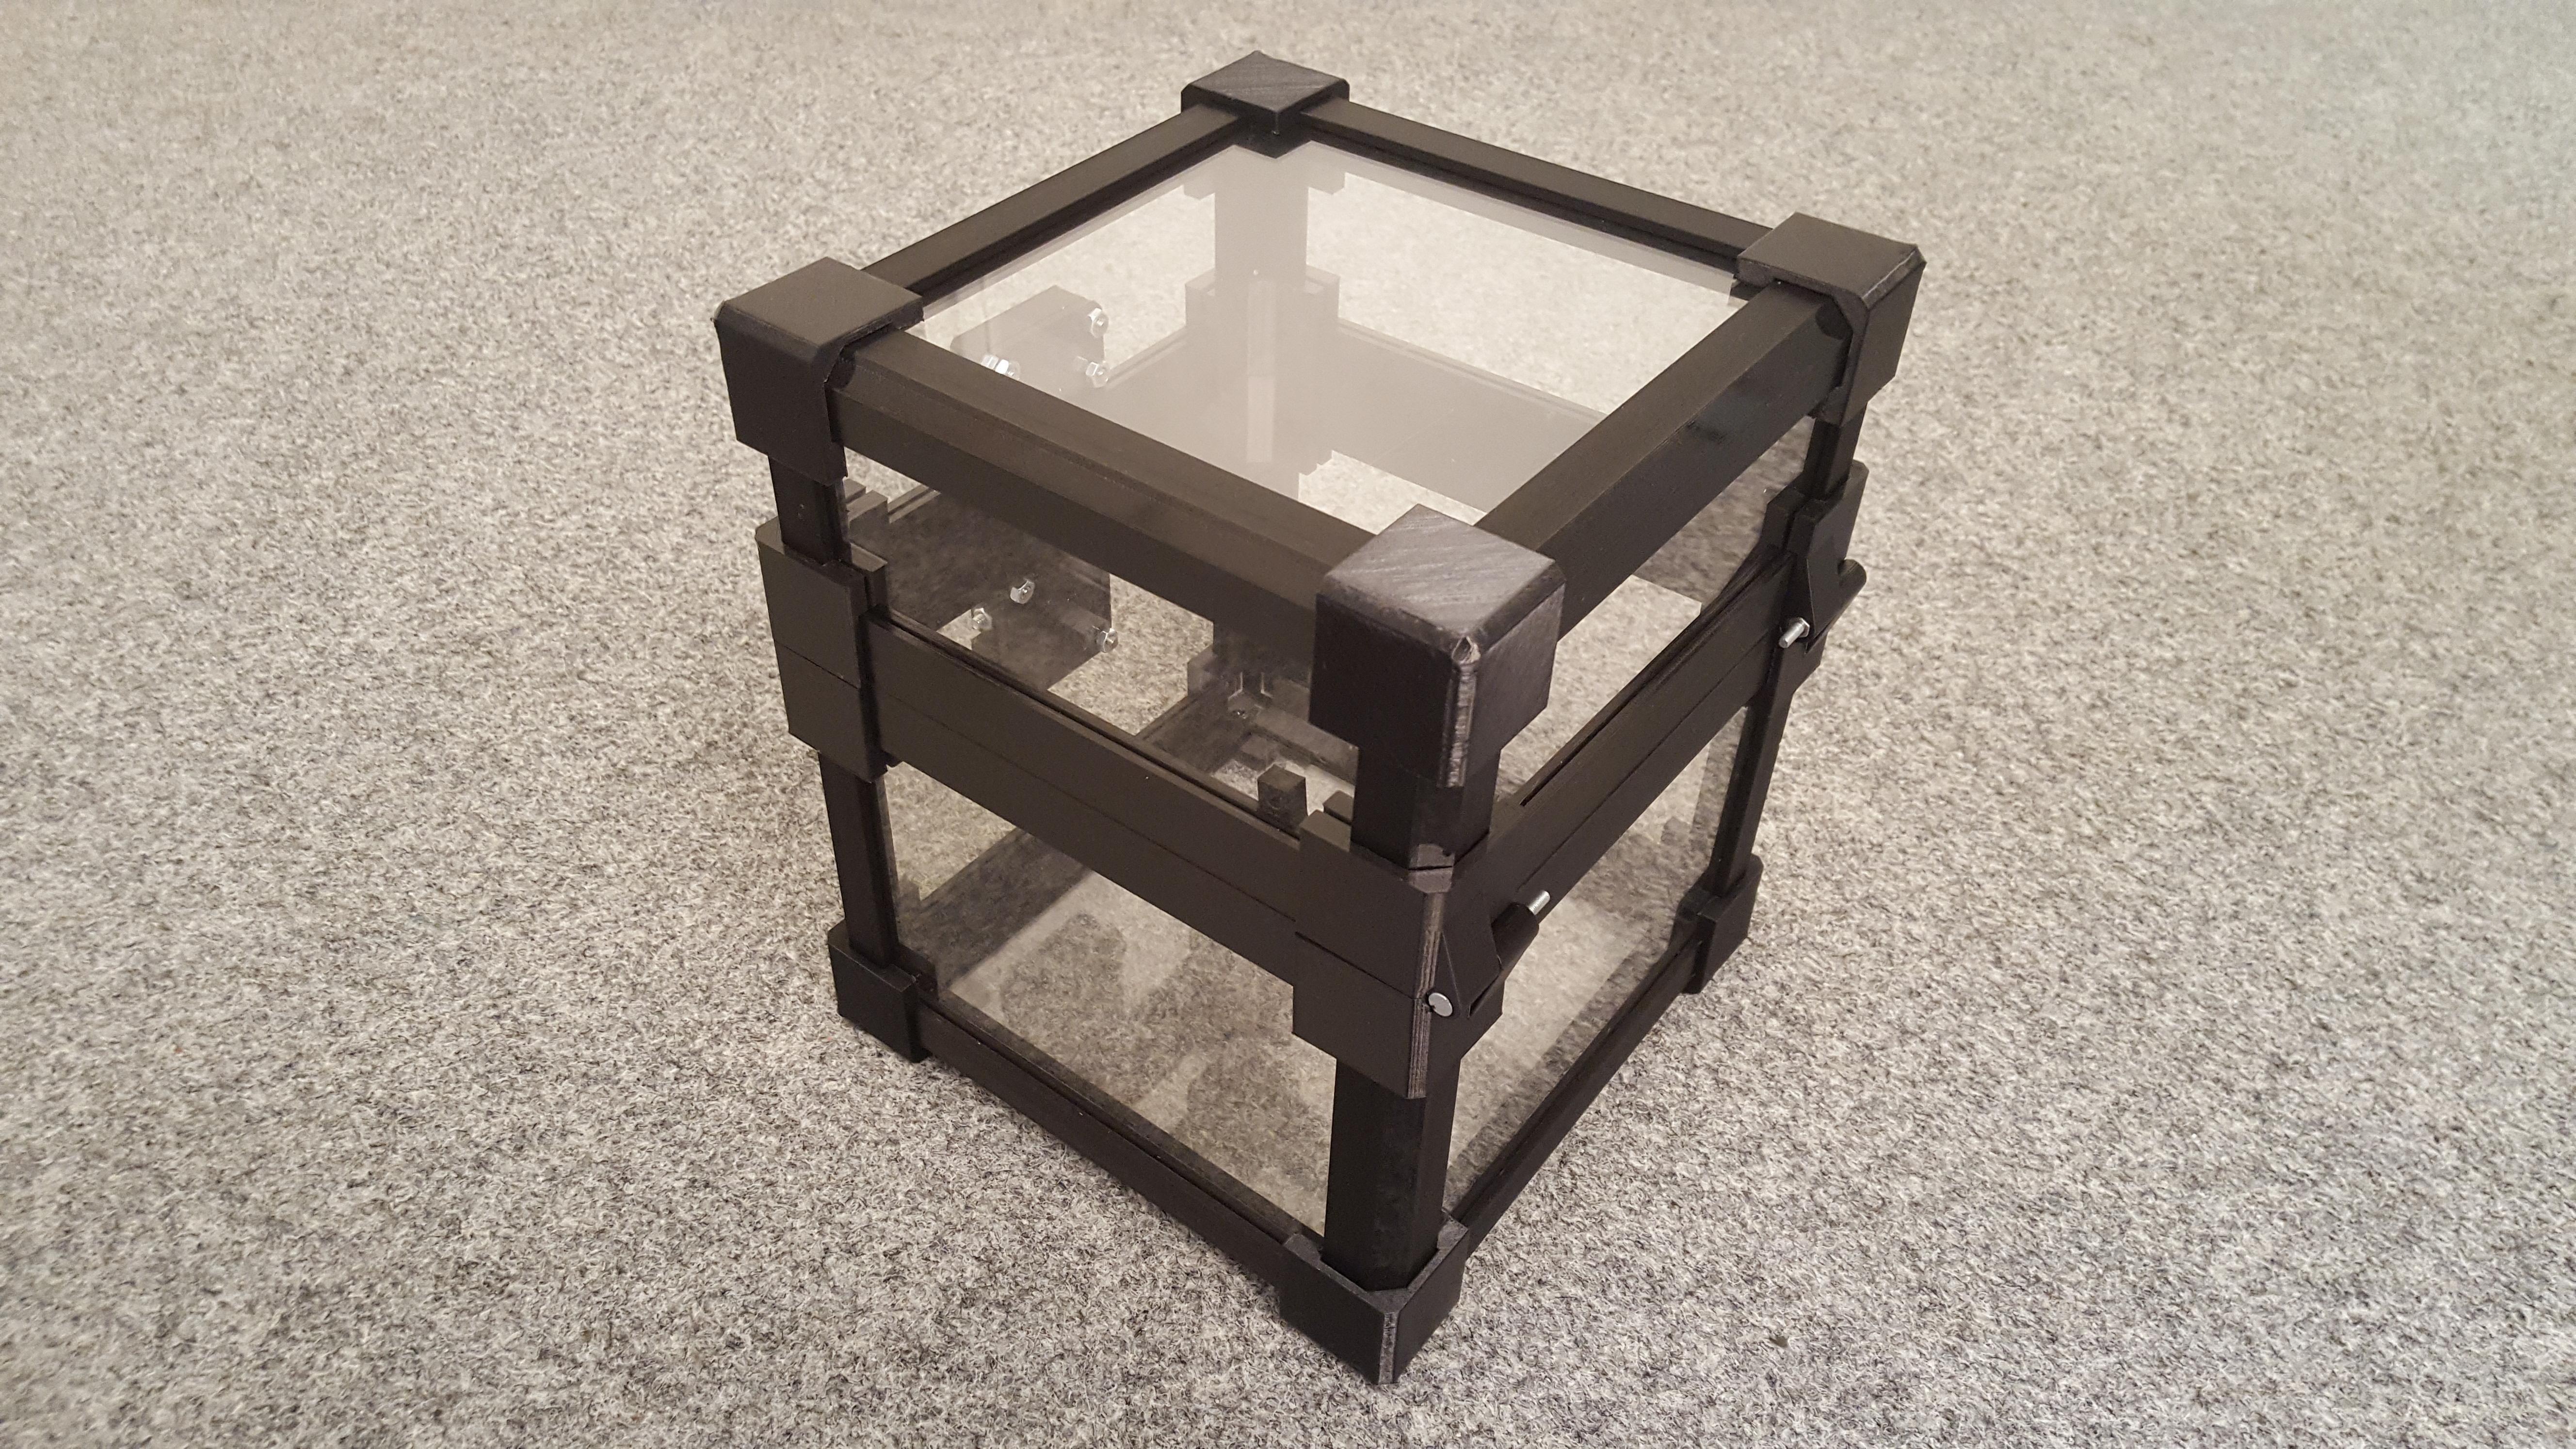 20190818_164650.jpg Download STL file LazyMans Box • Model to 3D print, Job